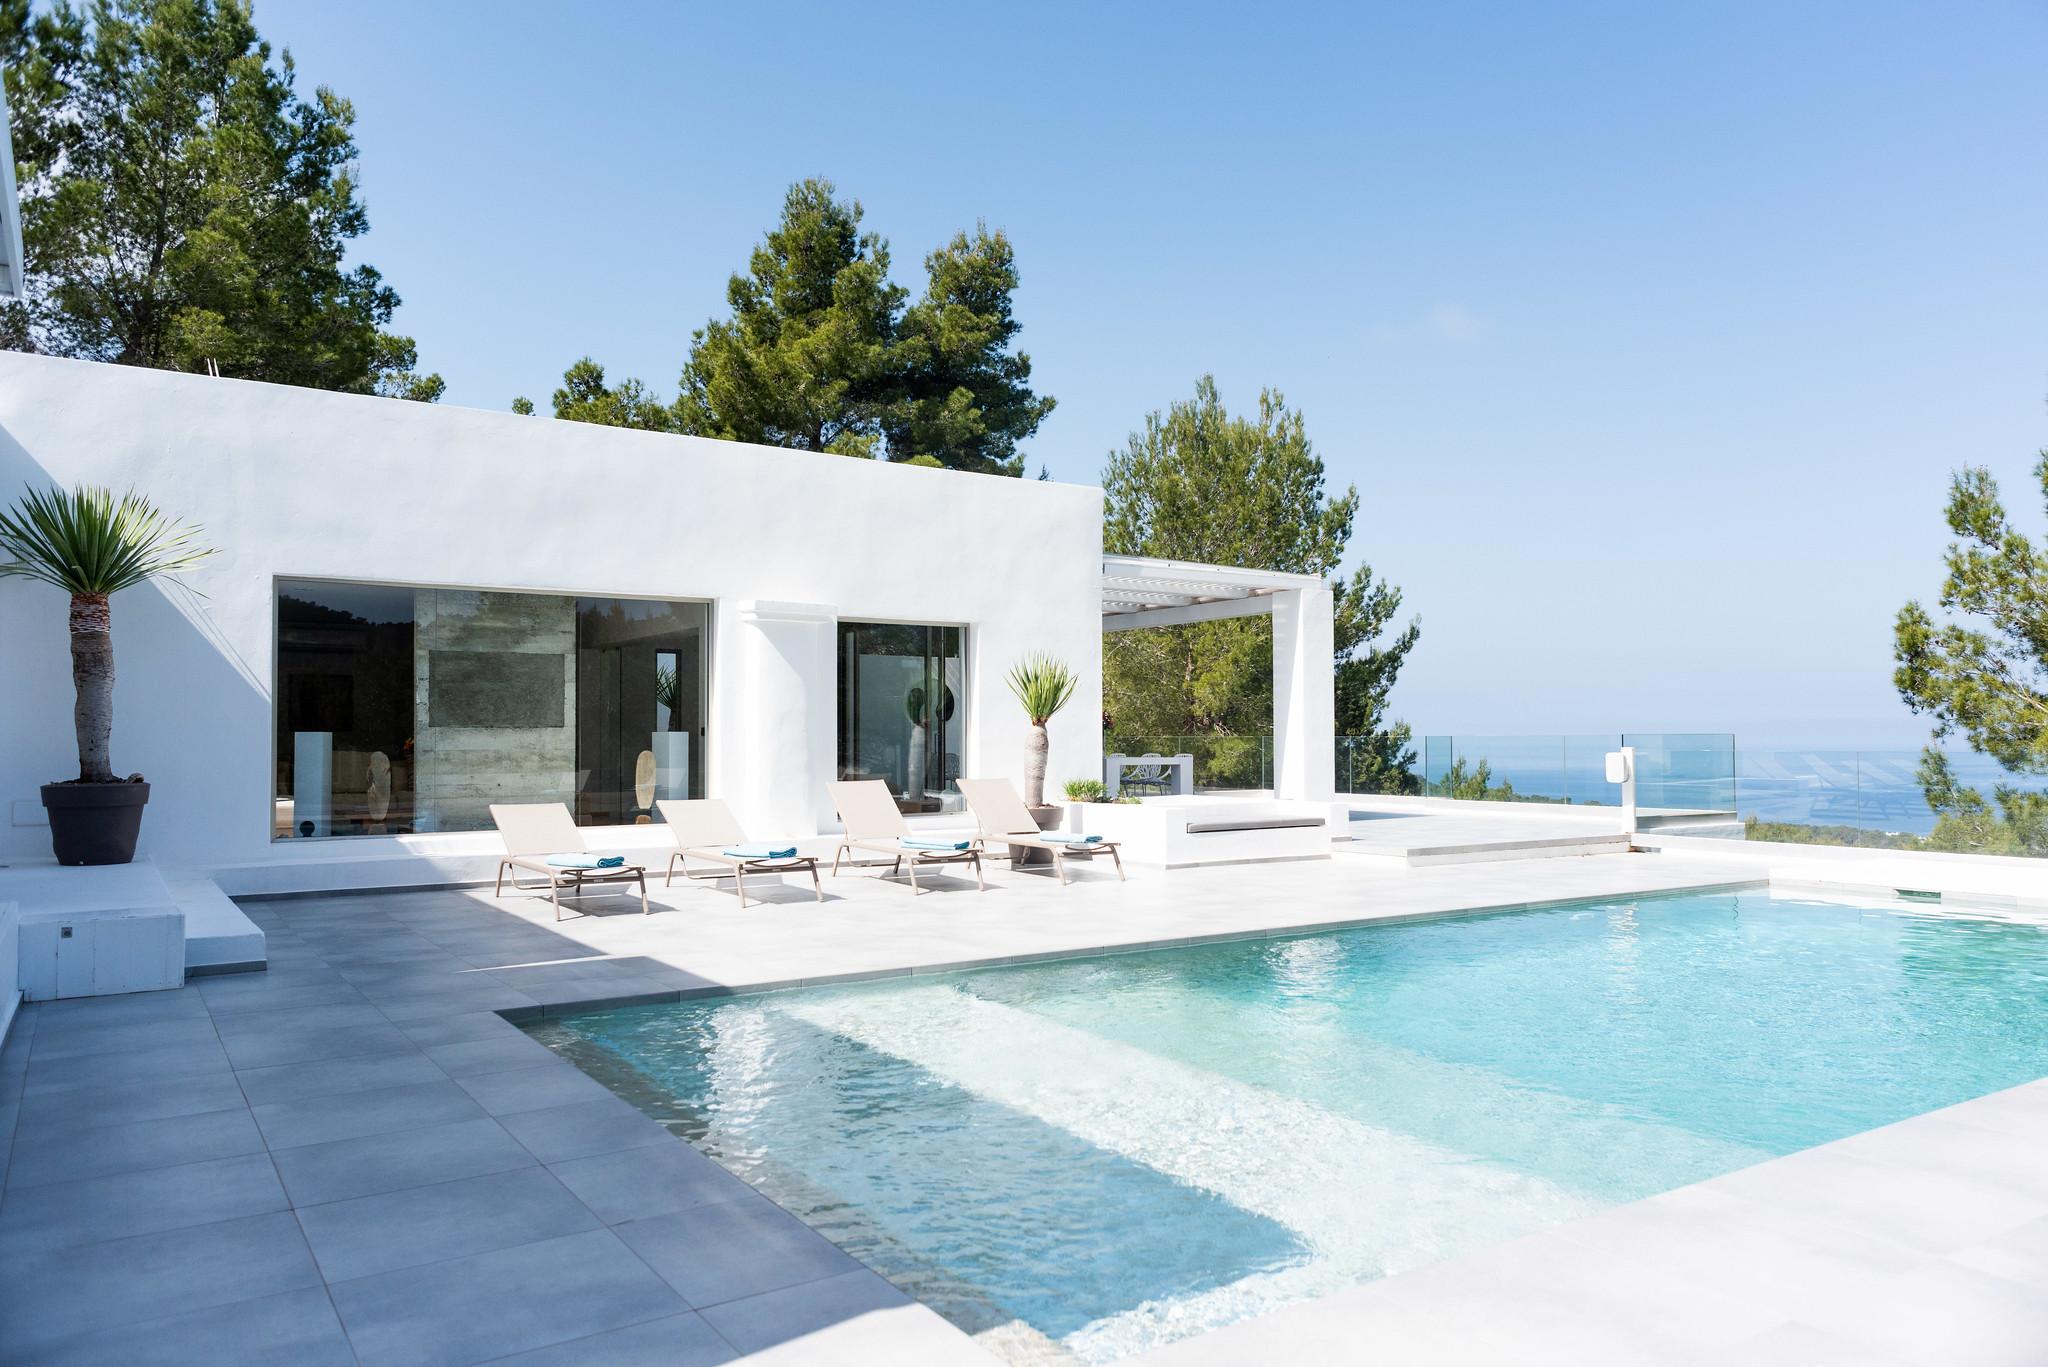 https://www.white-ibiza.com/wp-content/uploads/2020/05/white-ibiza-villas-can-dela-view-to-house.jpg